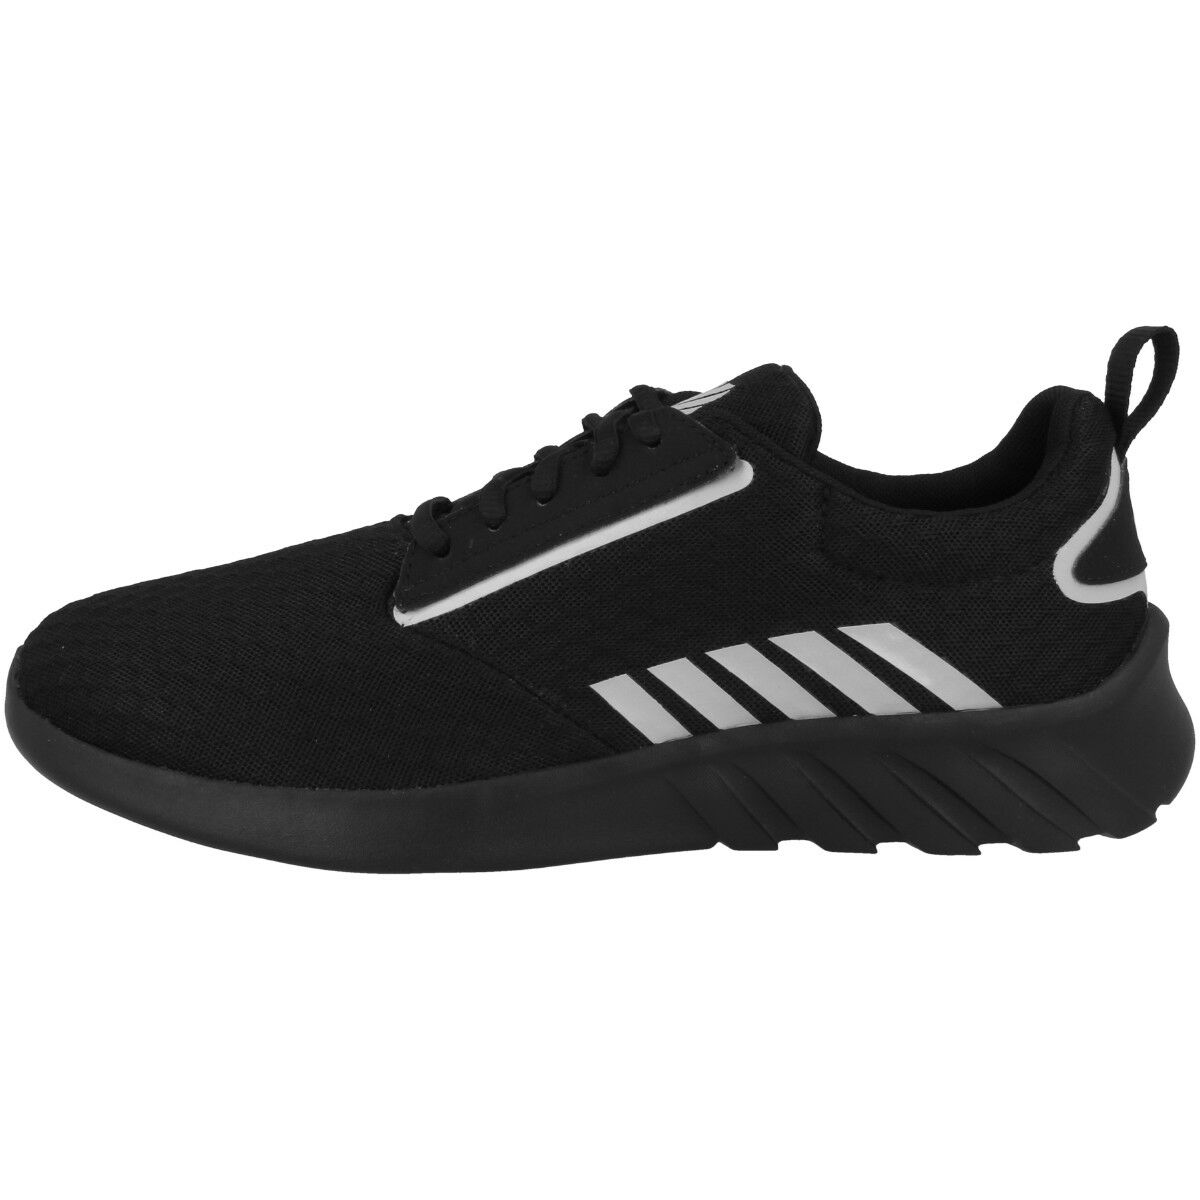 K-Swiss Aeronaut Men scarpe da ginnastica Uomo Sport Tempo Libero Scarpe Da Ginnastica 05618-060 | marche  | Uomini/Donna Scarpa